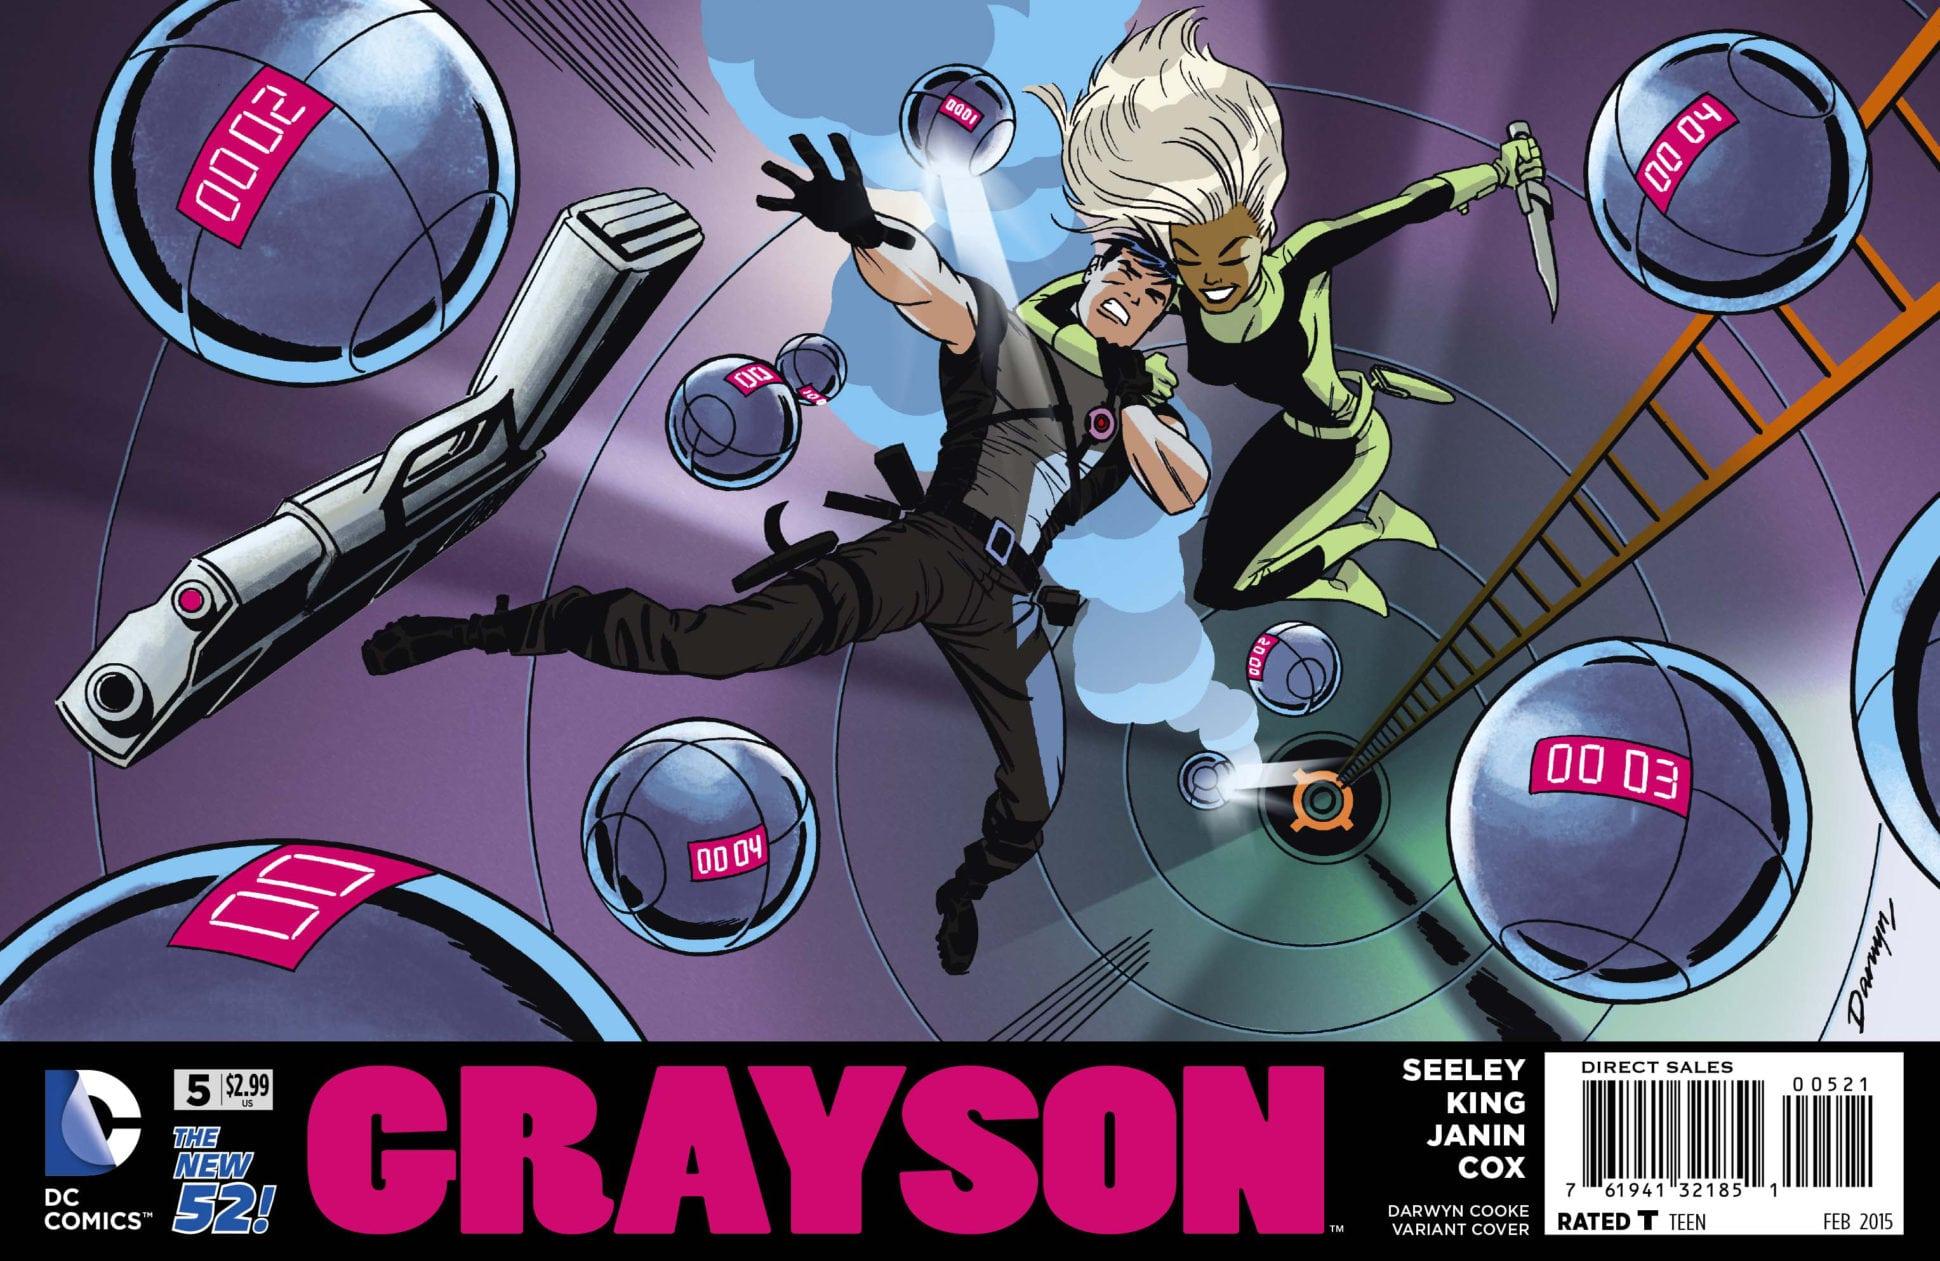 Grayson #5